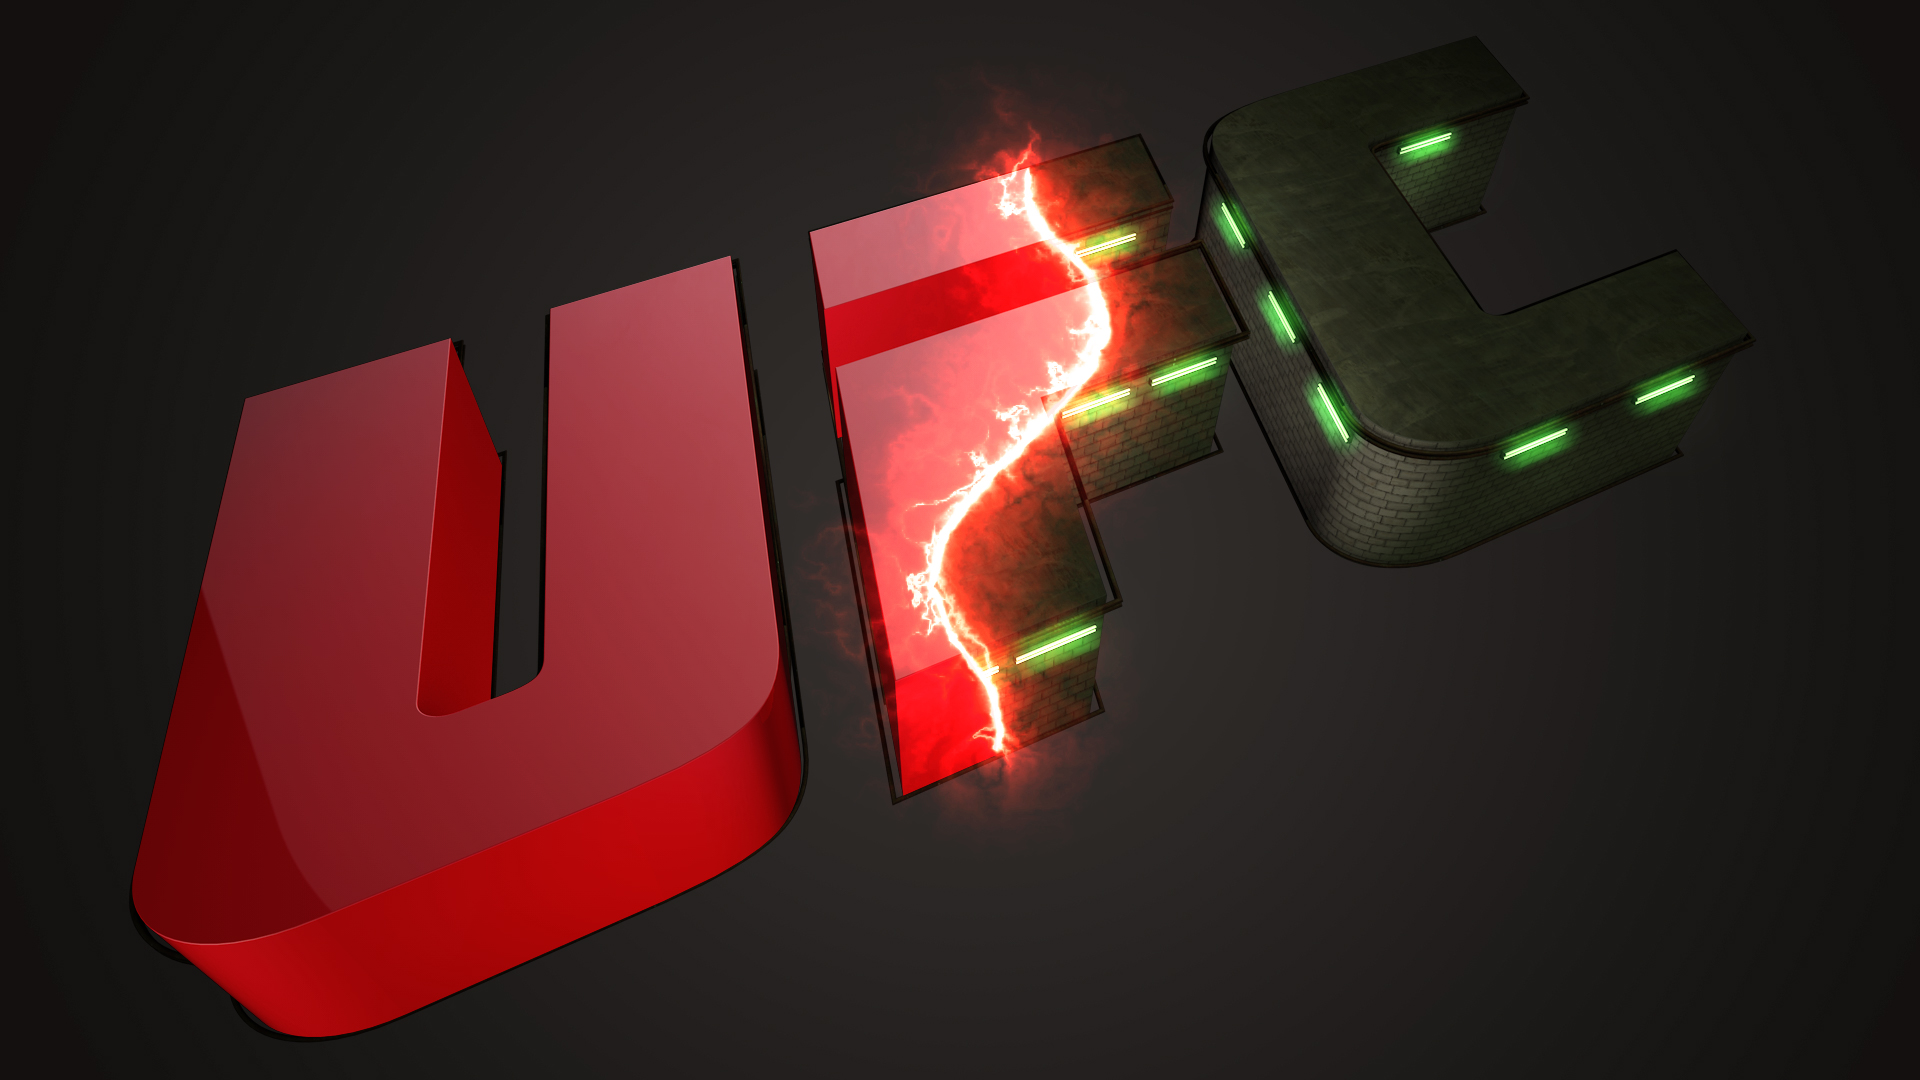 UFC_StyleFrameV2_Frame01_V2.jpg